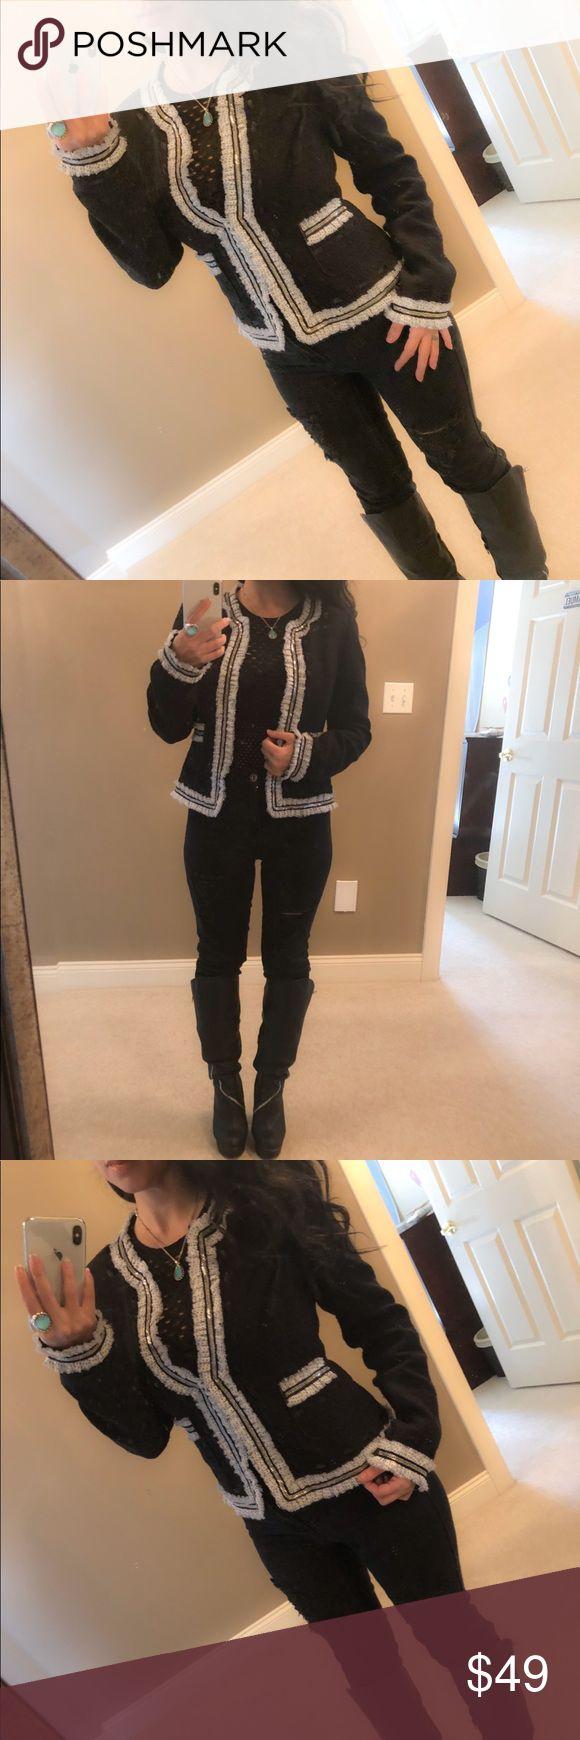 WHBM blazer top silver whites black jacket chain 1 hour flash sale only $25 ♥️♥️♥️♥️♥️Gorgeous blazer by White House Black Market Very gently worn Size 2  🌸🌸🌸🌸🌸🌸🌸🌸🌸 Bundle and save White House Black Market Jackets & Coats Blazers